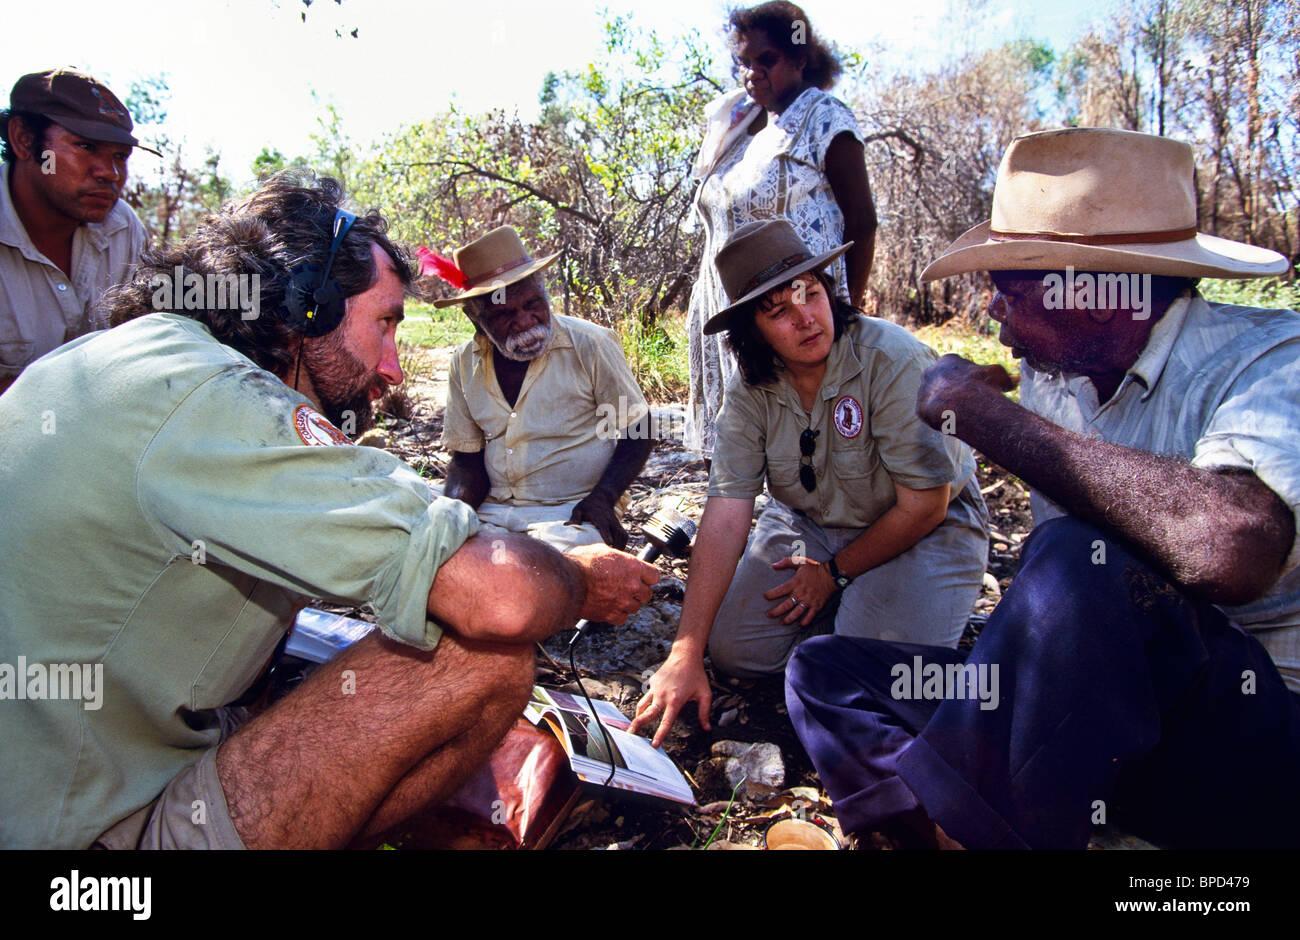 Ethnobotanist interviewing indigenous Australians, Australia - Stock Image